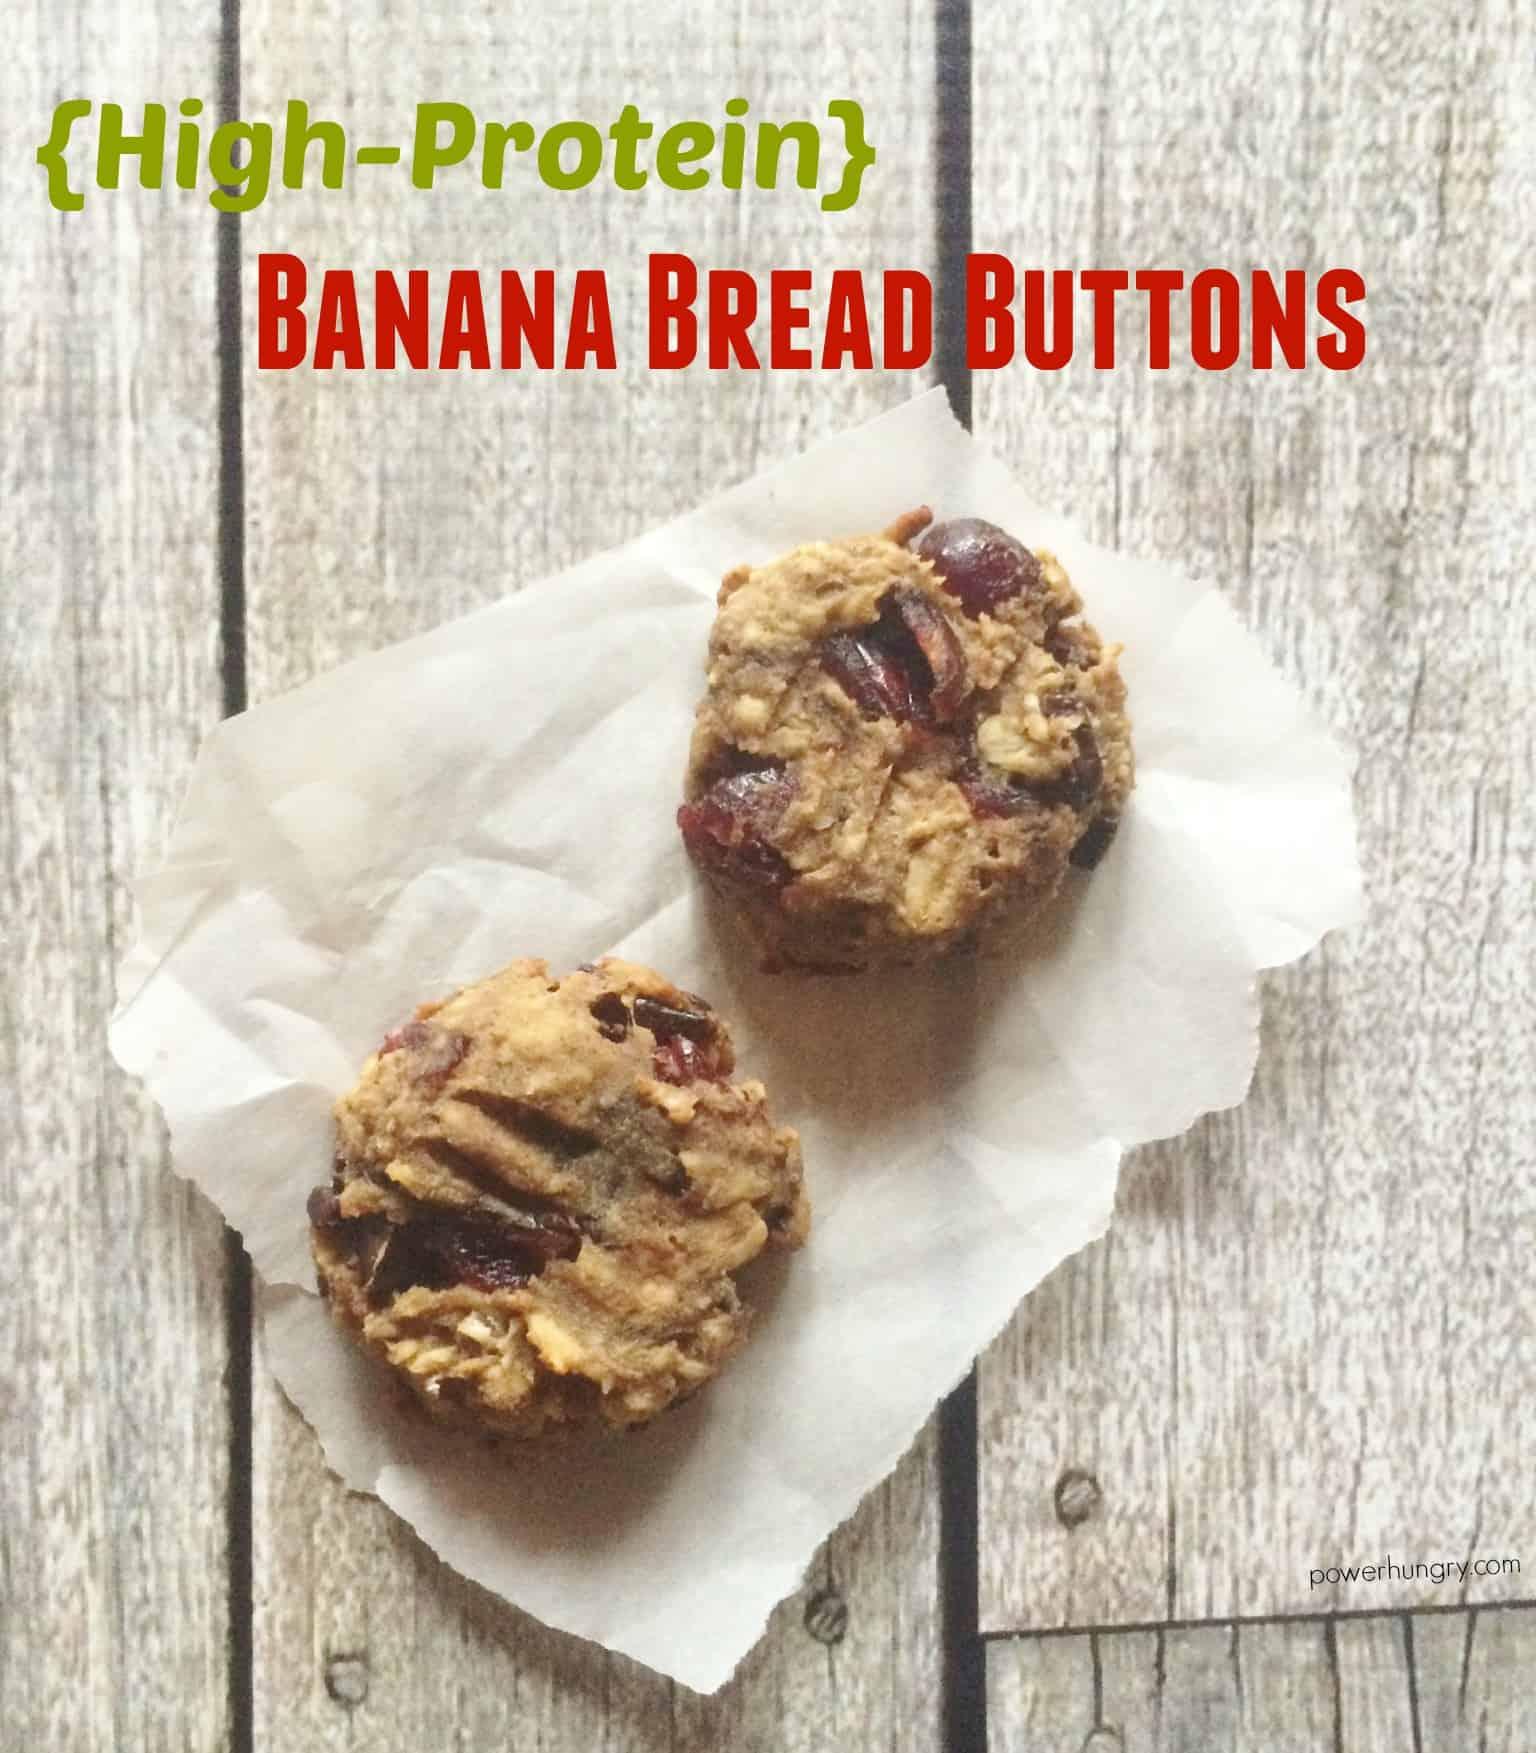 High-Protein Banana Bread Buttons {vegan, gluten-free}